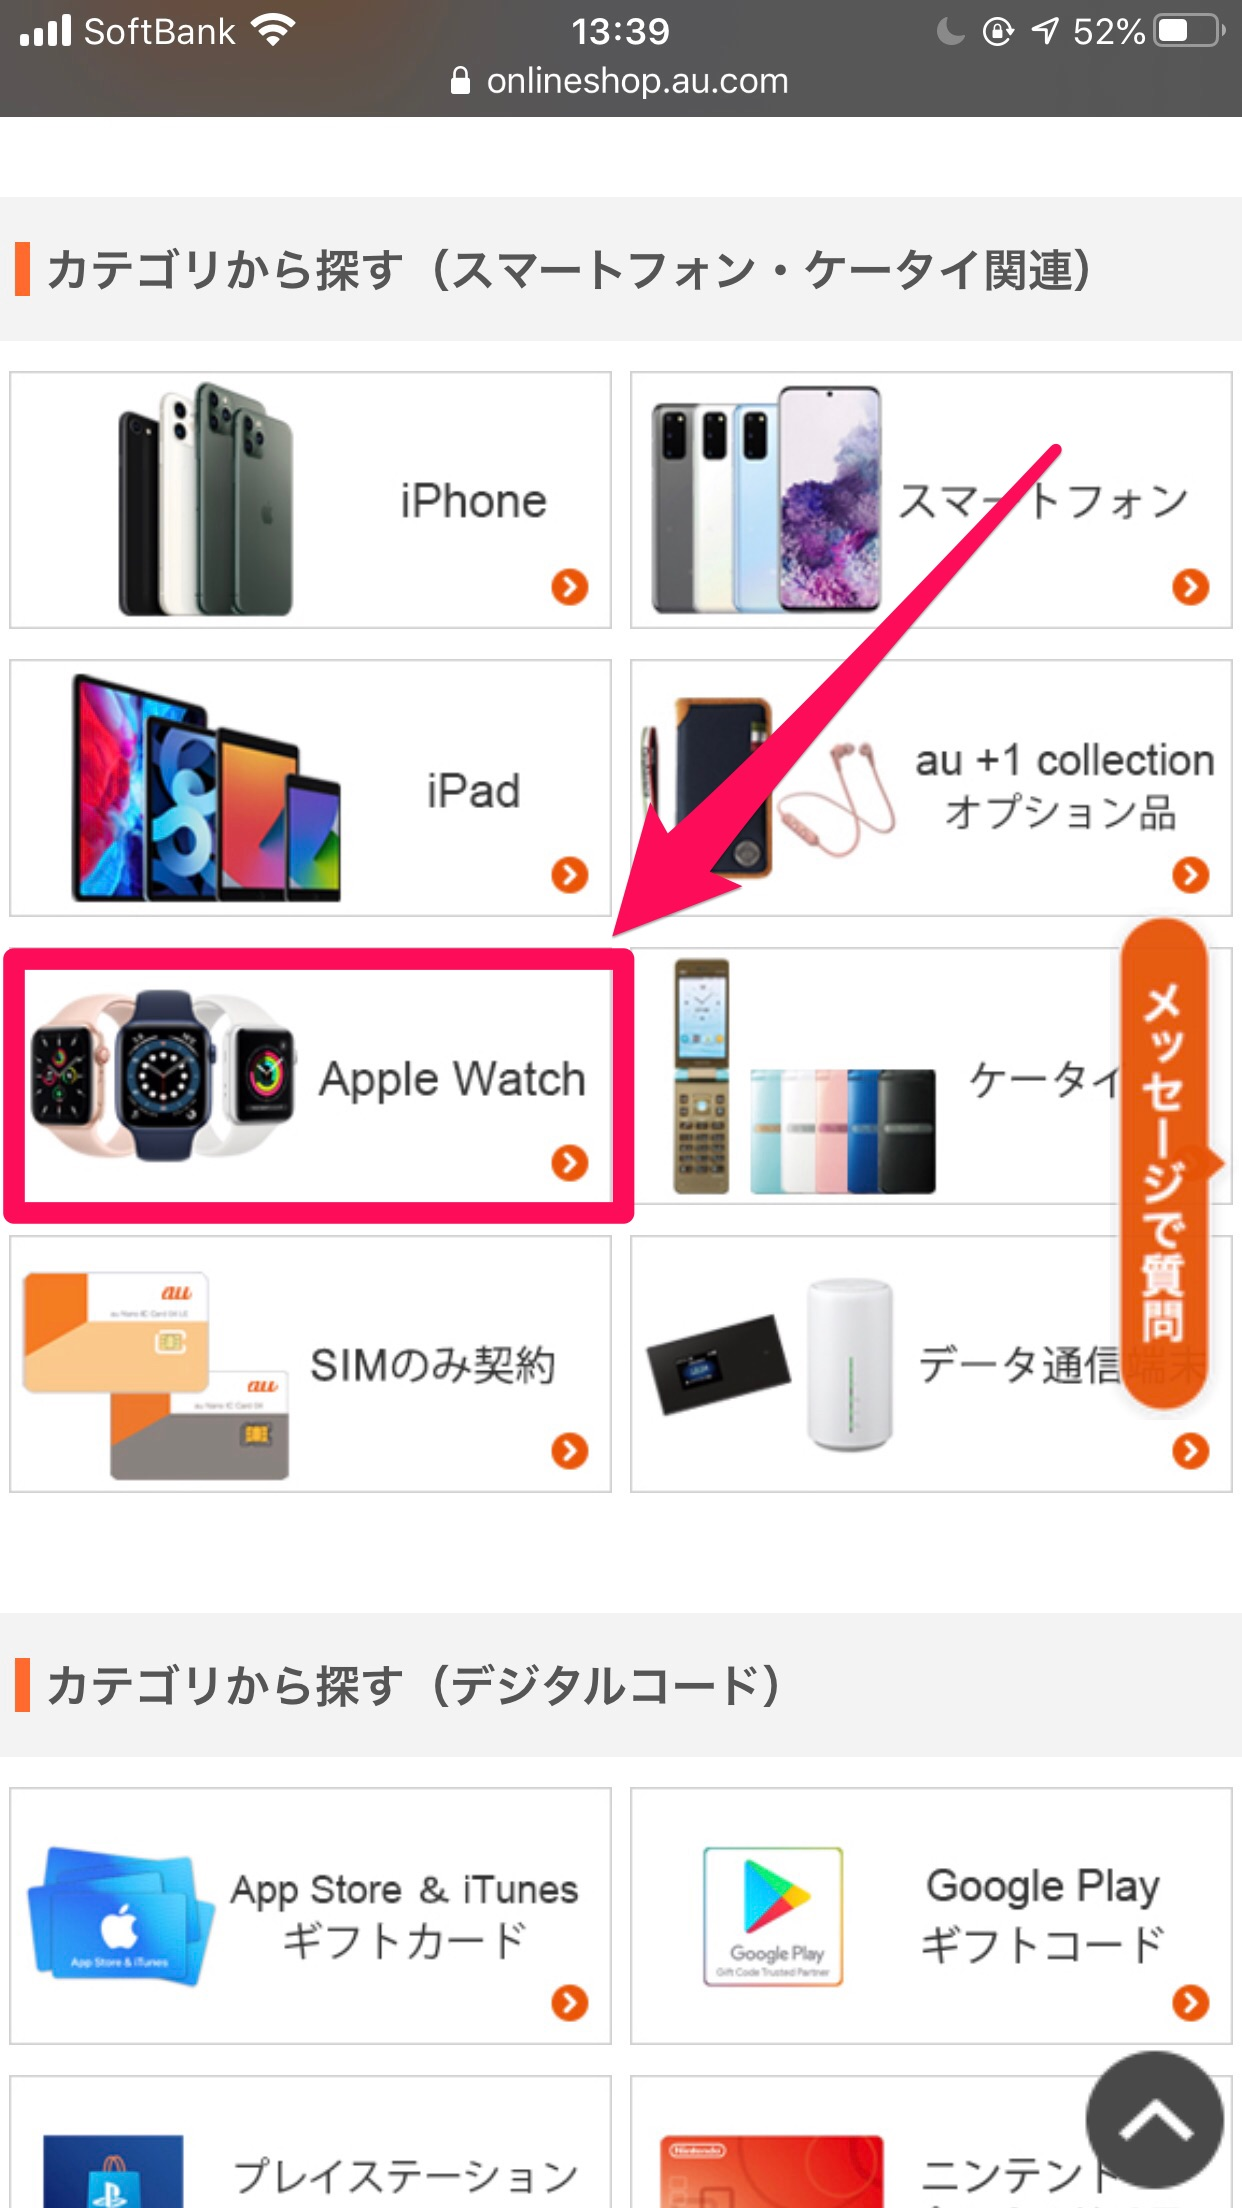 auオンラインショップでApple Watch購入手順1